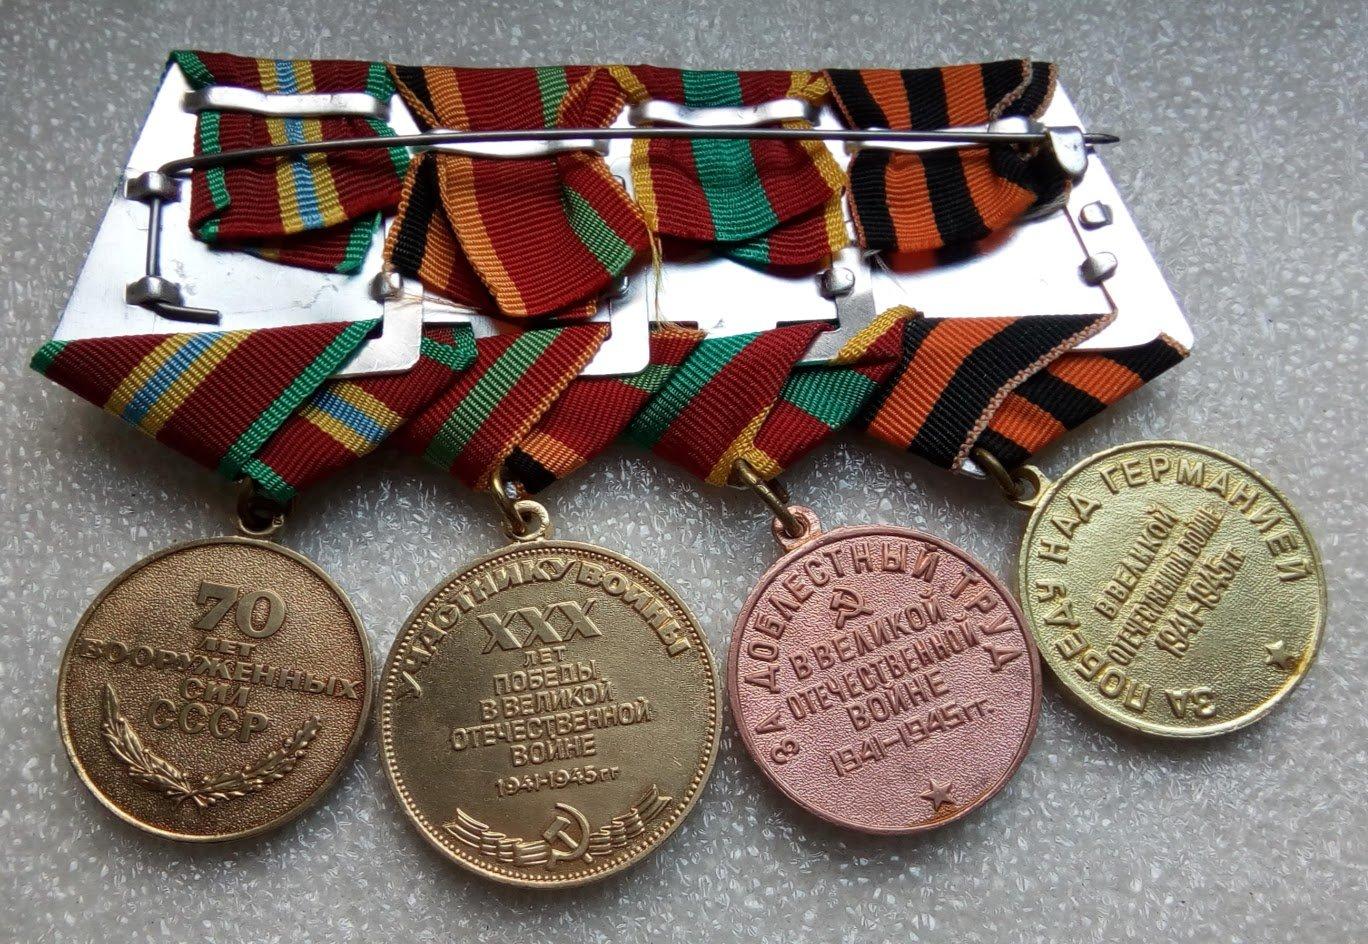 Set 4 Soviet Army USSR Russian Medals Veteran WW II Red Army RKKA Communist Bolshevik Period Cold war era Militaria Soldiers Stalin